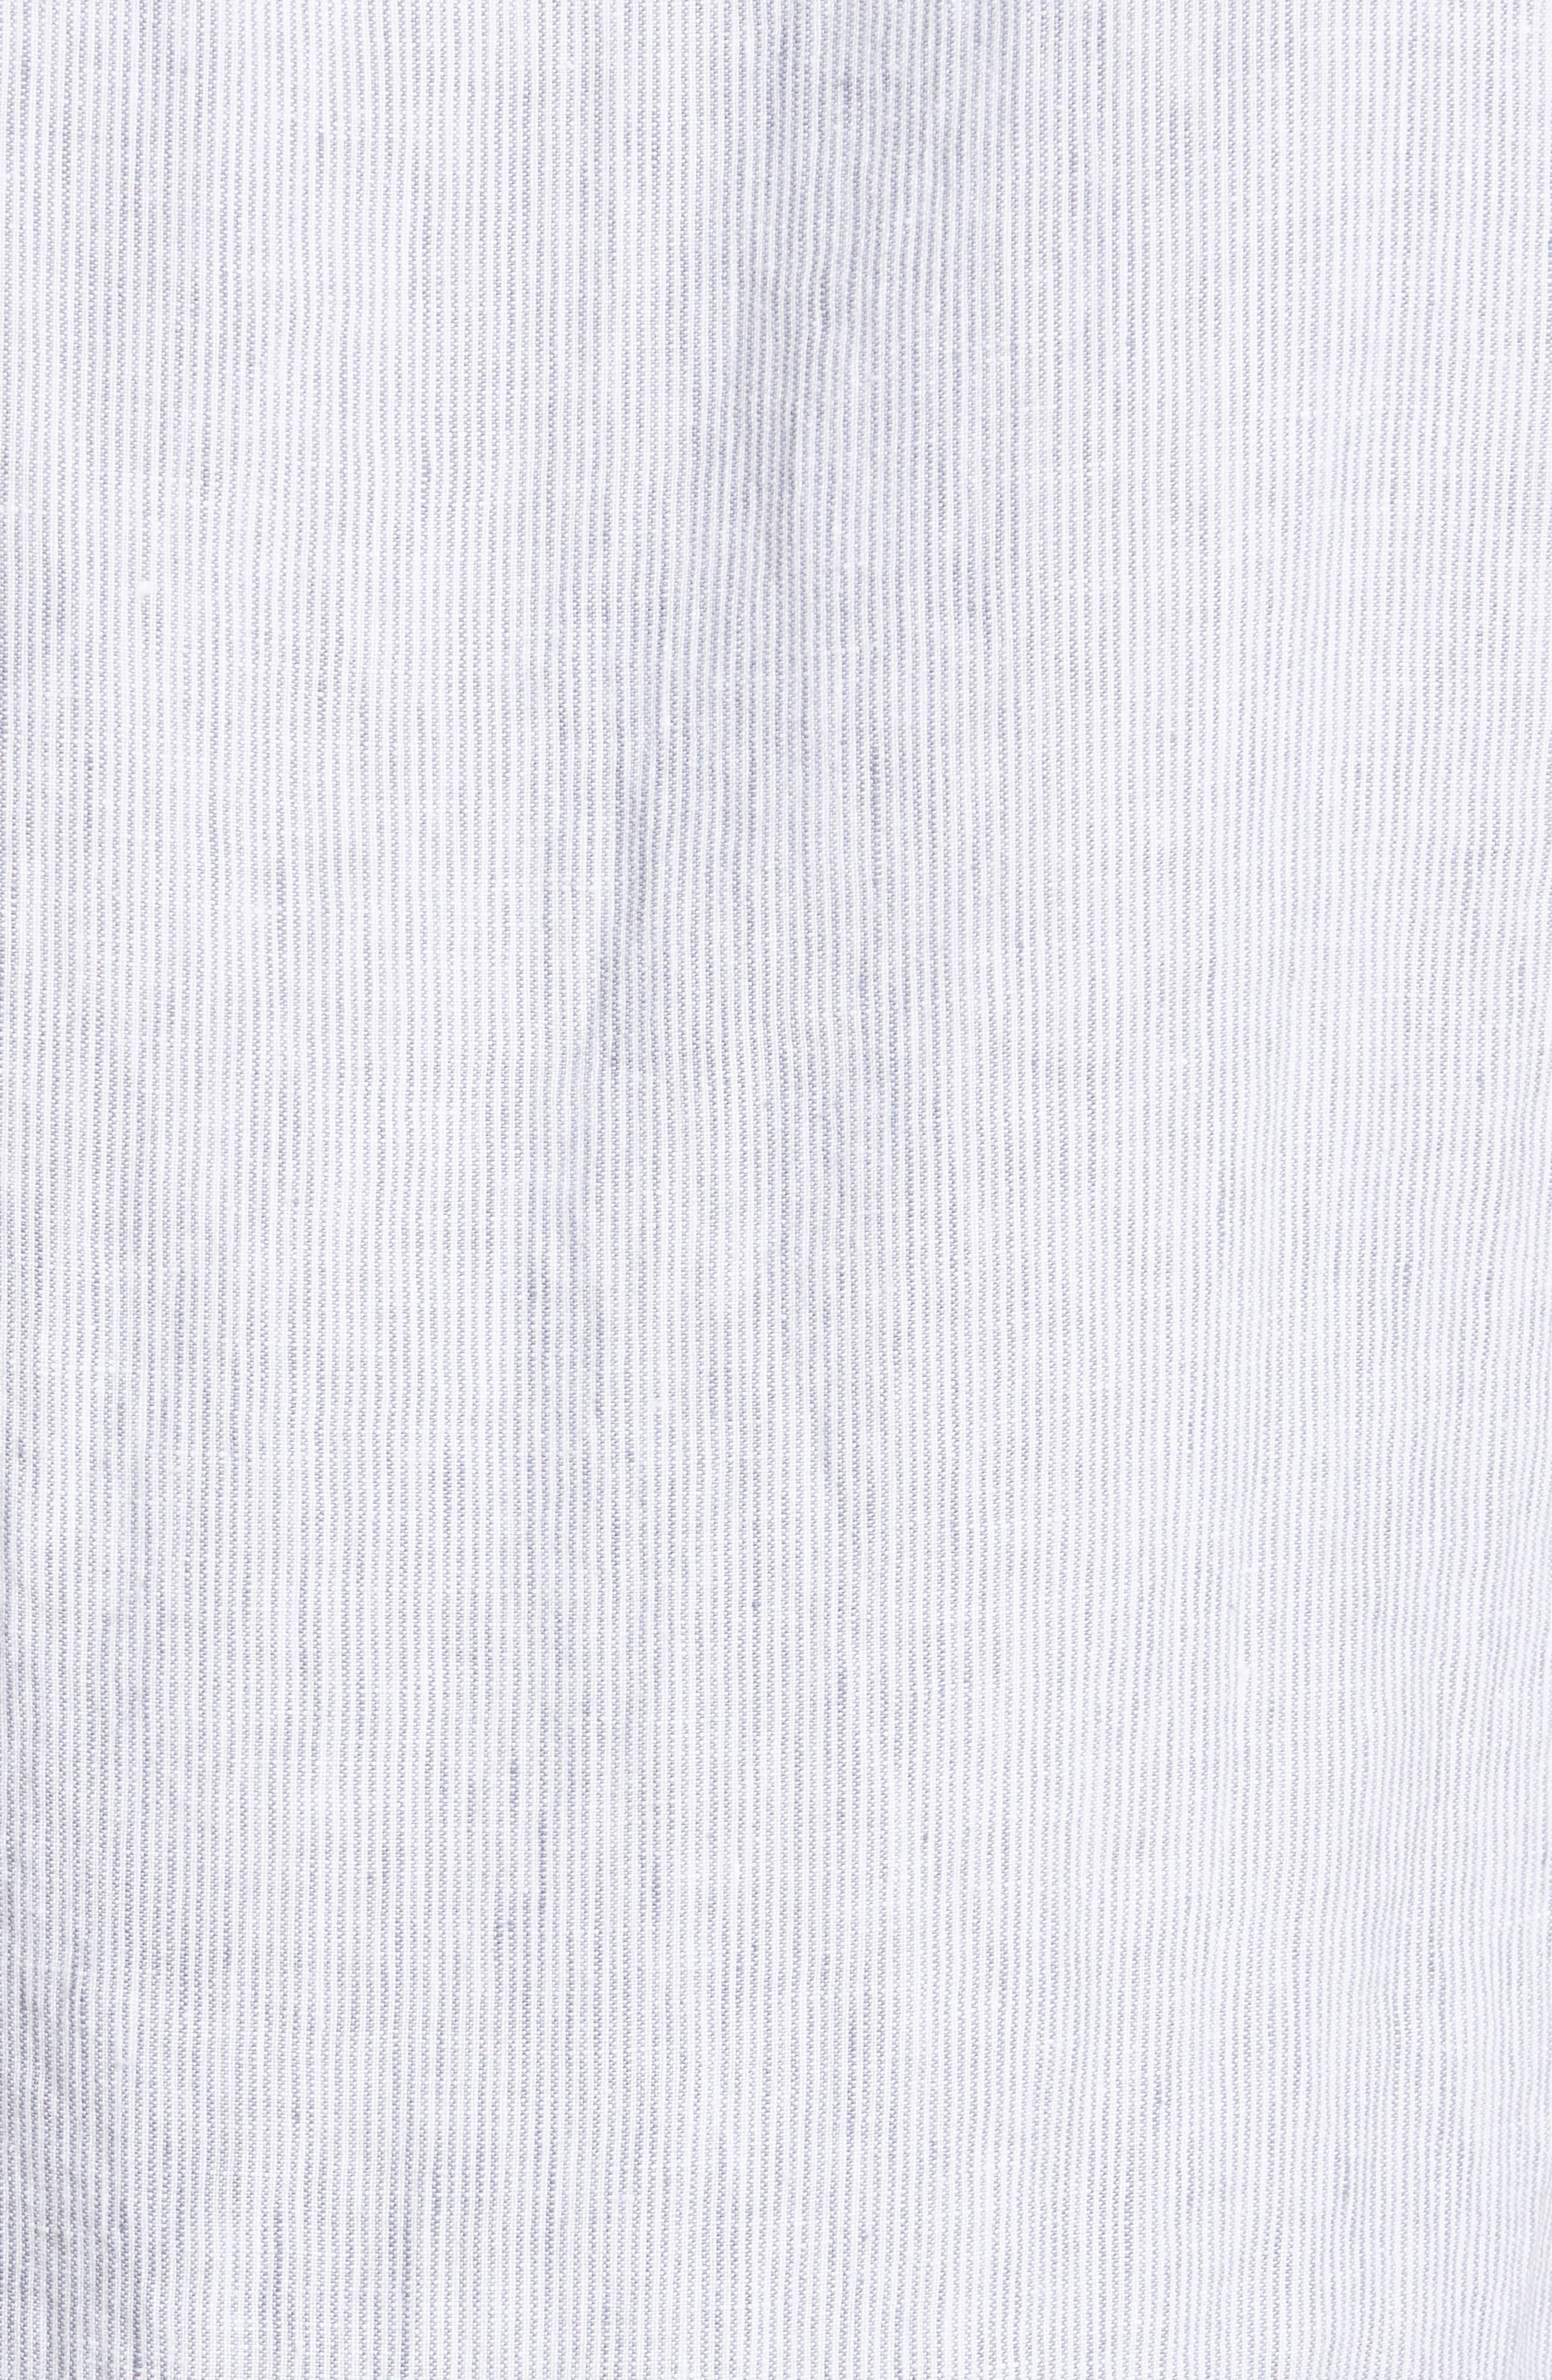 Trim Fit Microstripe Linen Shirt,                             Alternate thumbnail 2, color,                             100